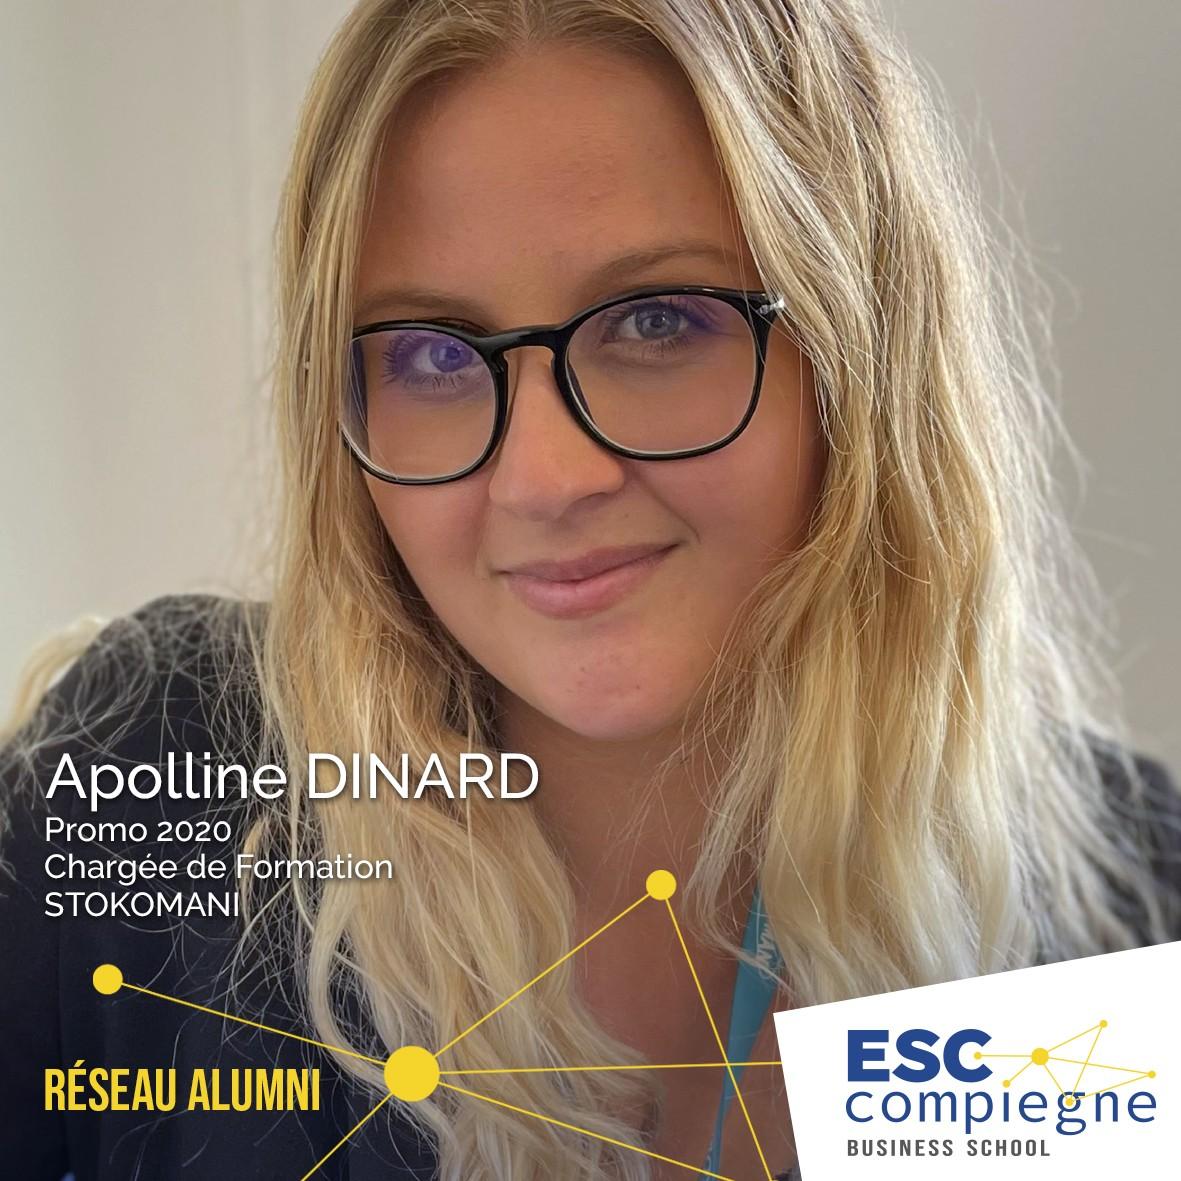 ESCC-Apolline-Dinard